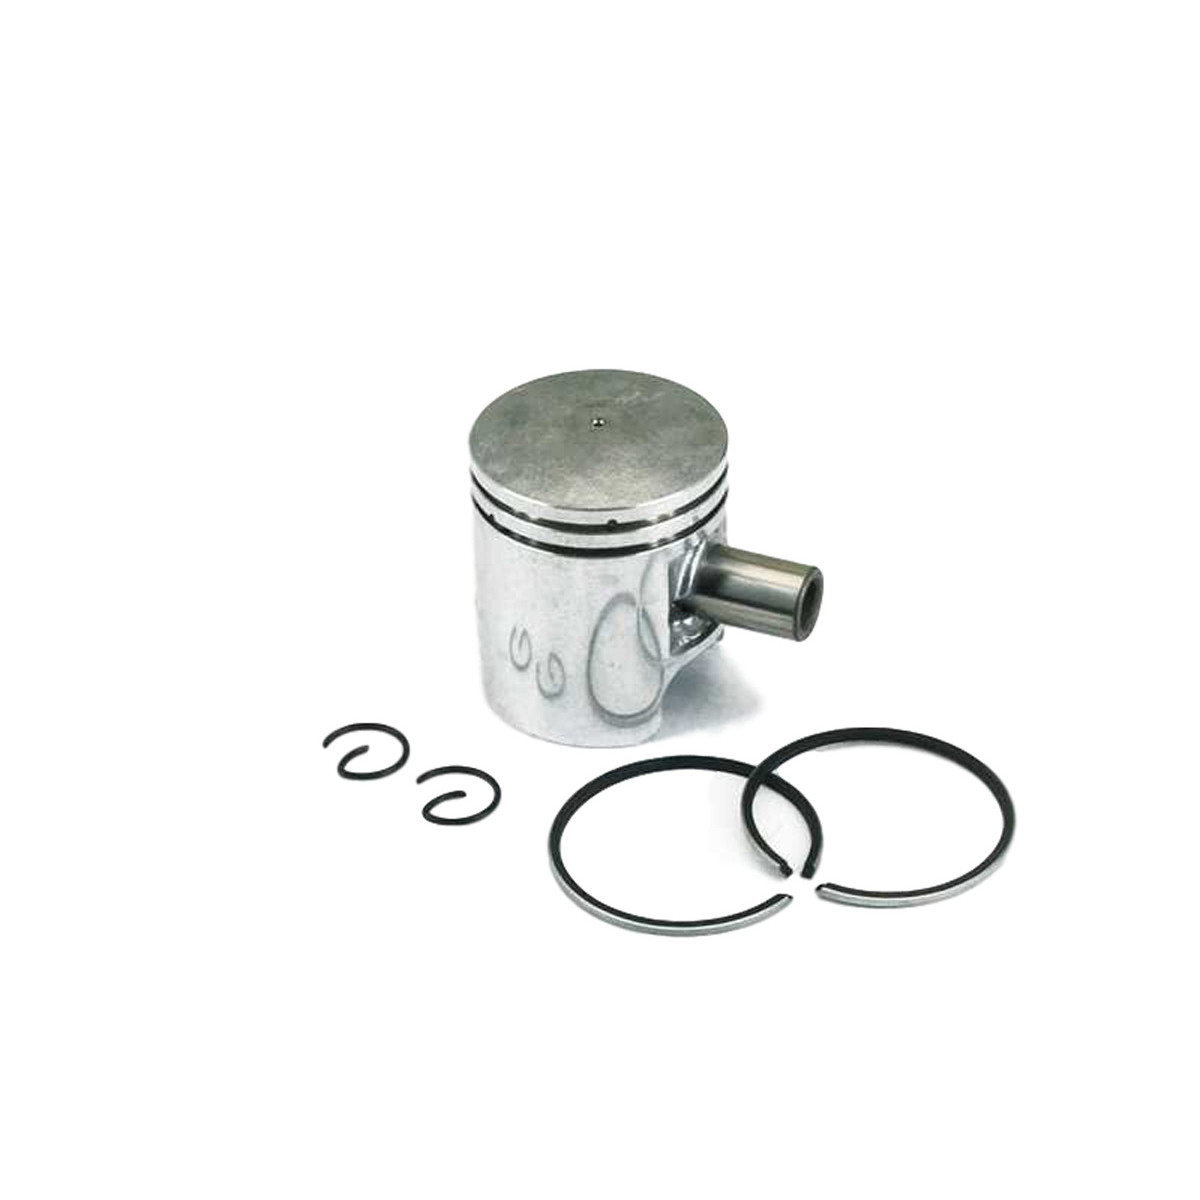 Piston pour Cylindre Alu PEUGEOT Buxy, Speedfight 50cc - TNT